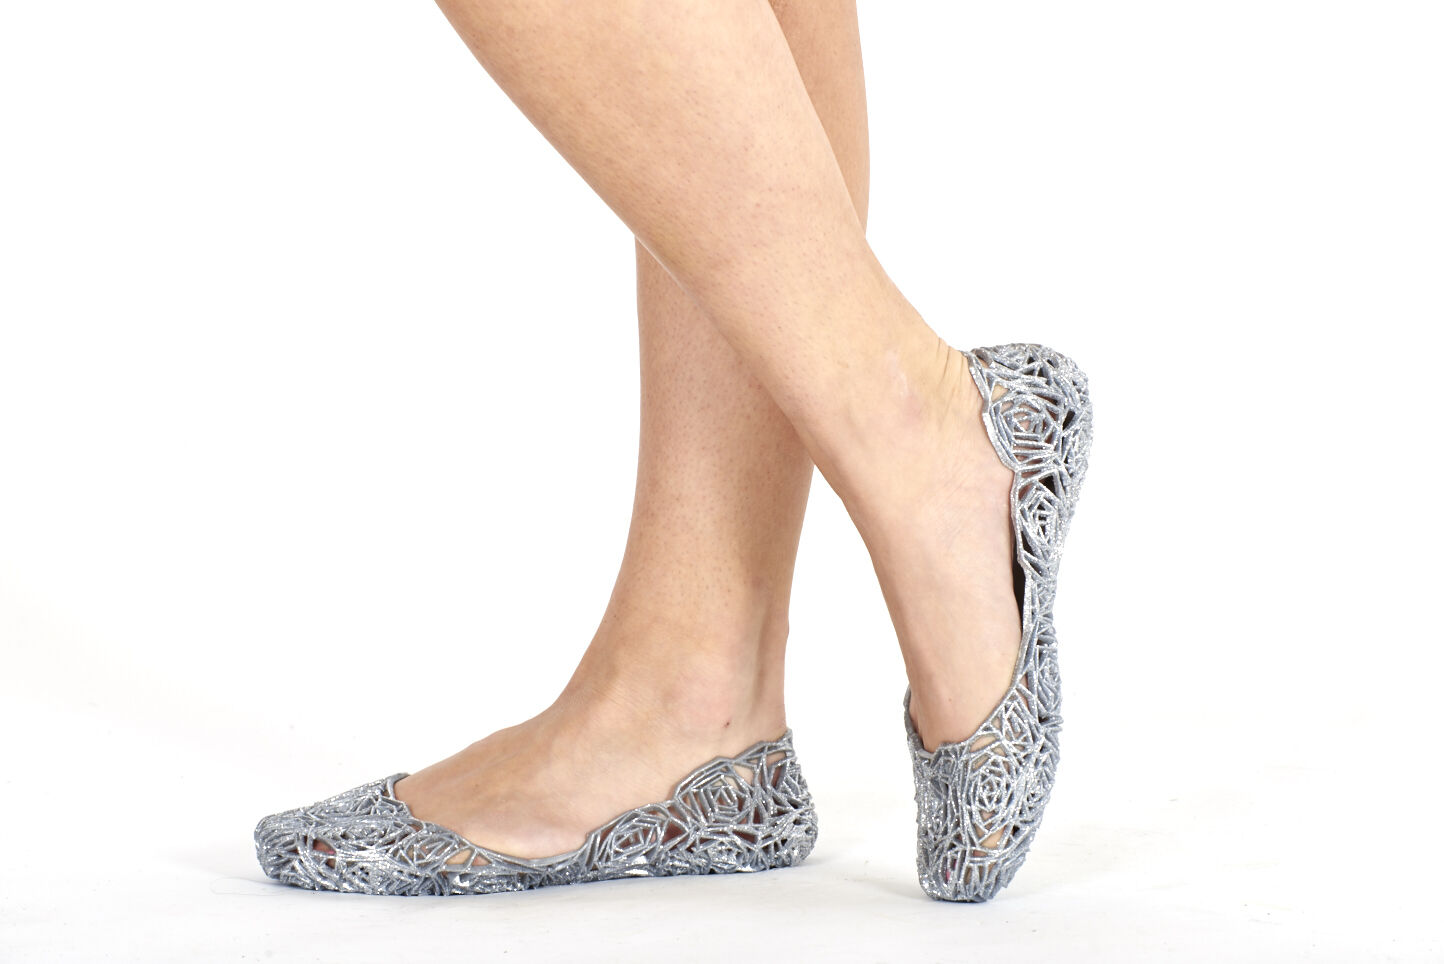 Para women planas Bailarina Ballet Ballet Ballet Suave Ocasional Gel Brillantina Zapatillas dee775